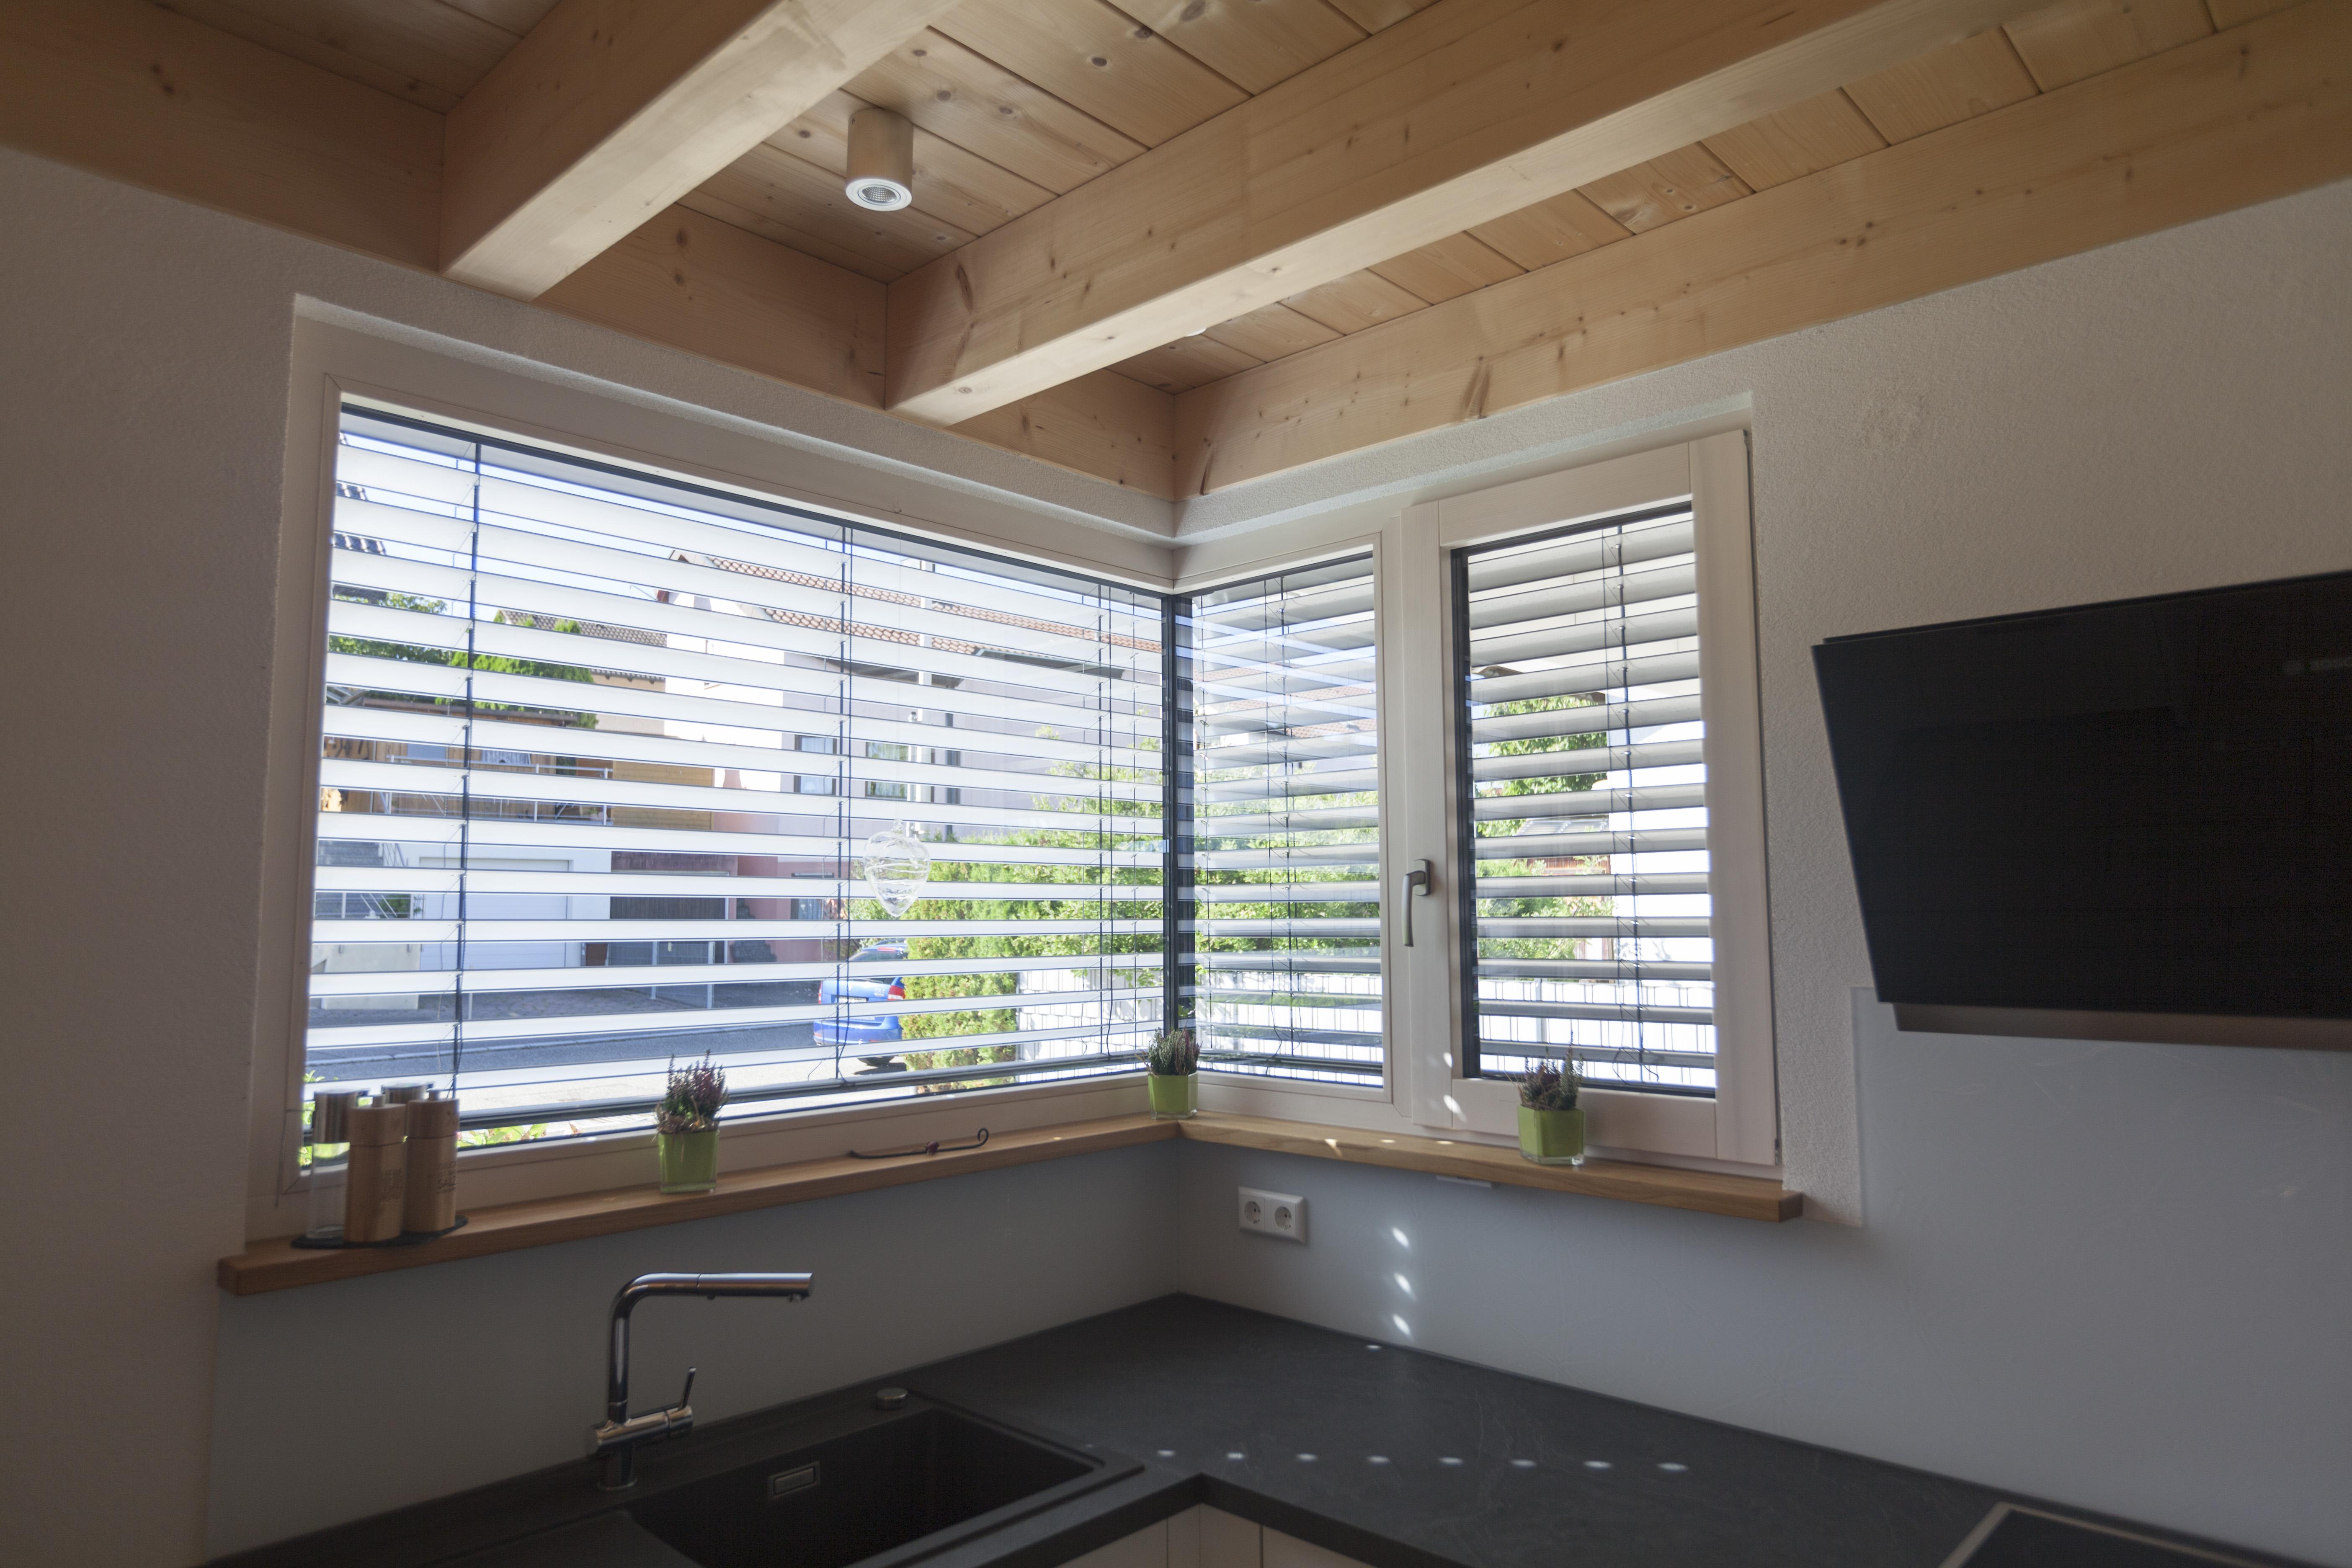 holz aluminium fenster pforzheimer fensterbau. Black Bedroom Furniture Sets. Home Design Ideas